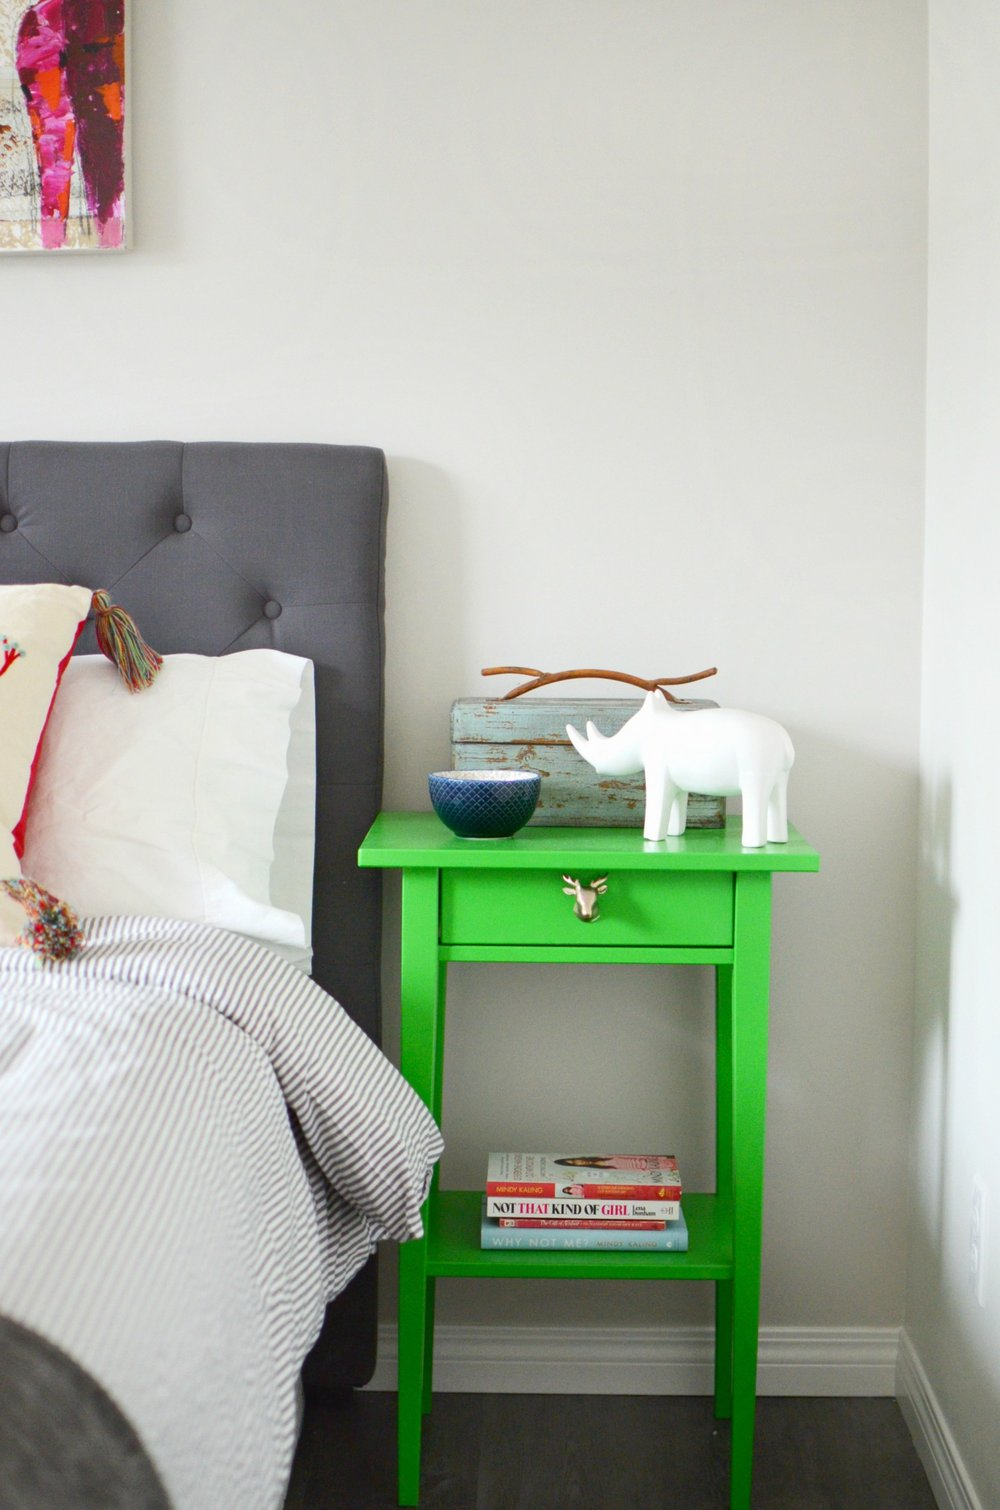 bedrom-bright-green-bedside-table-grey-stipe-bedding.jpg